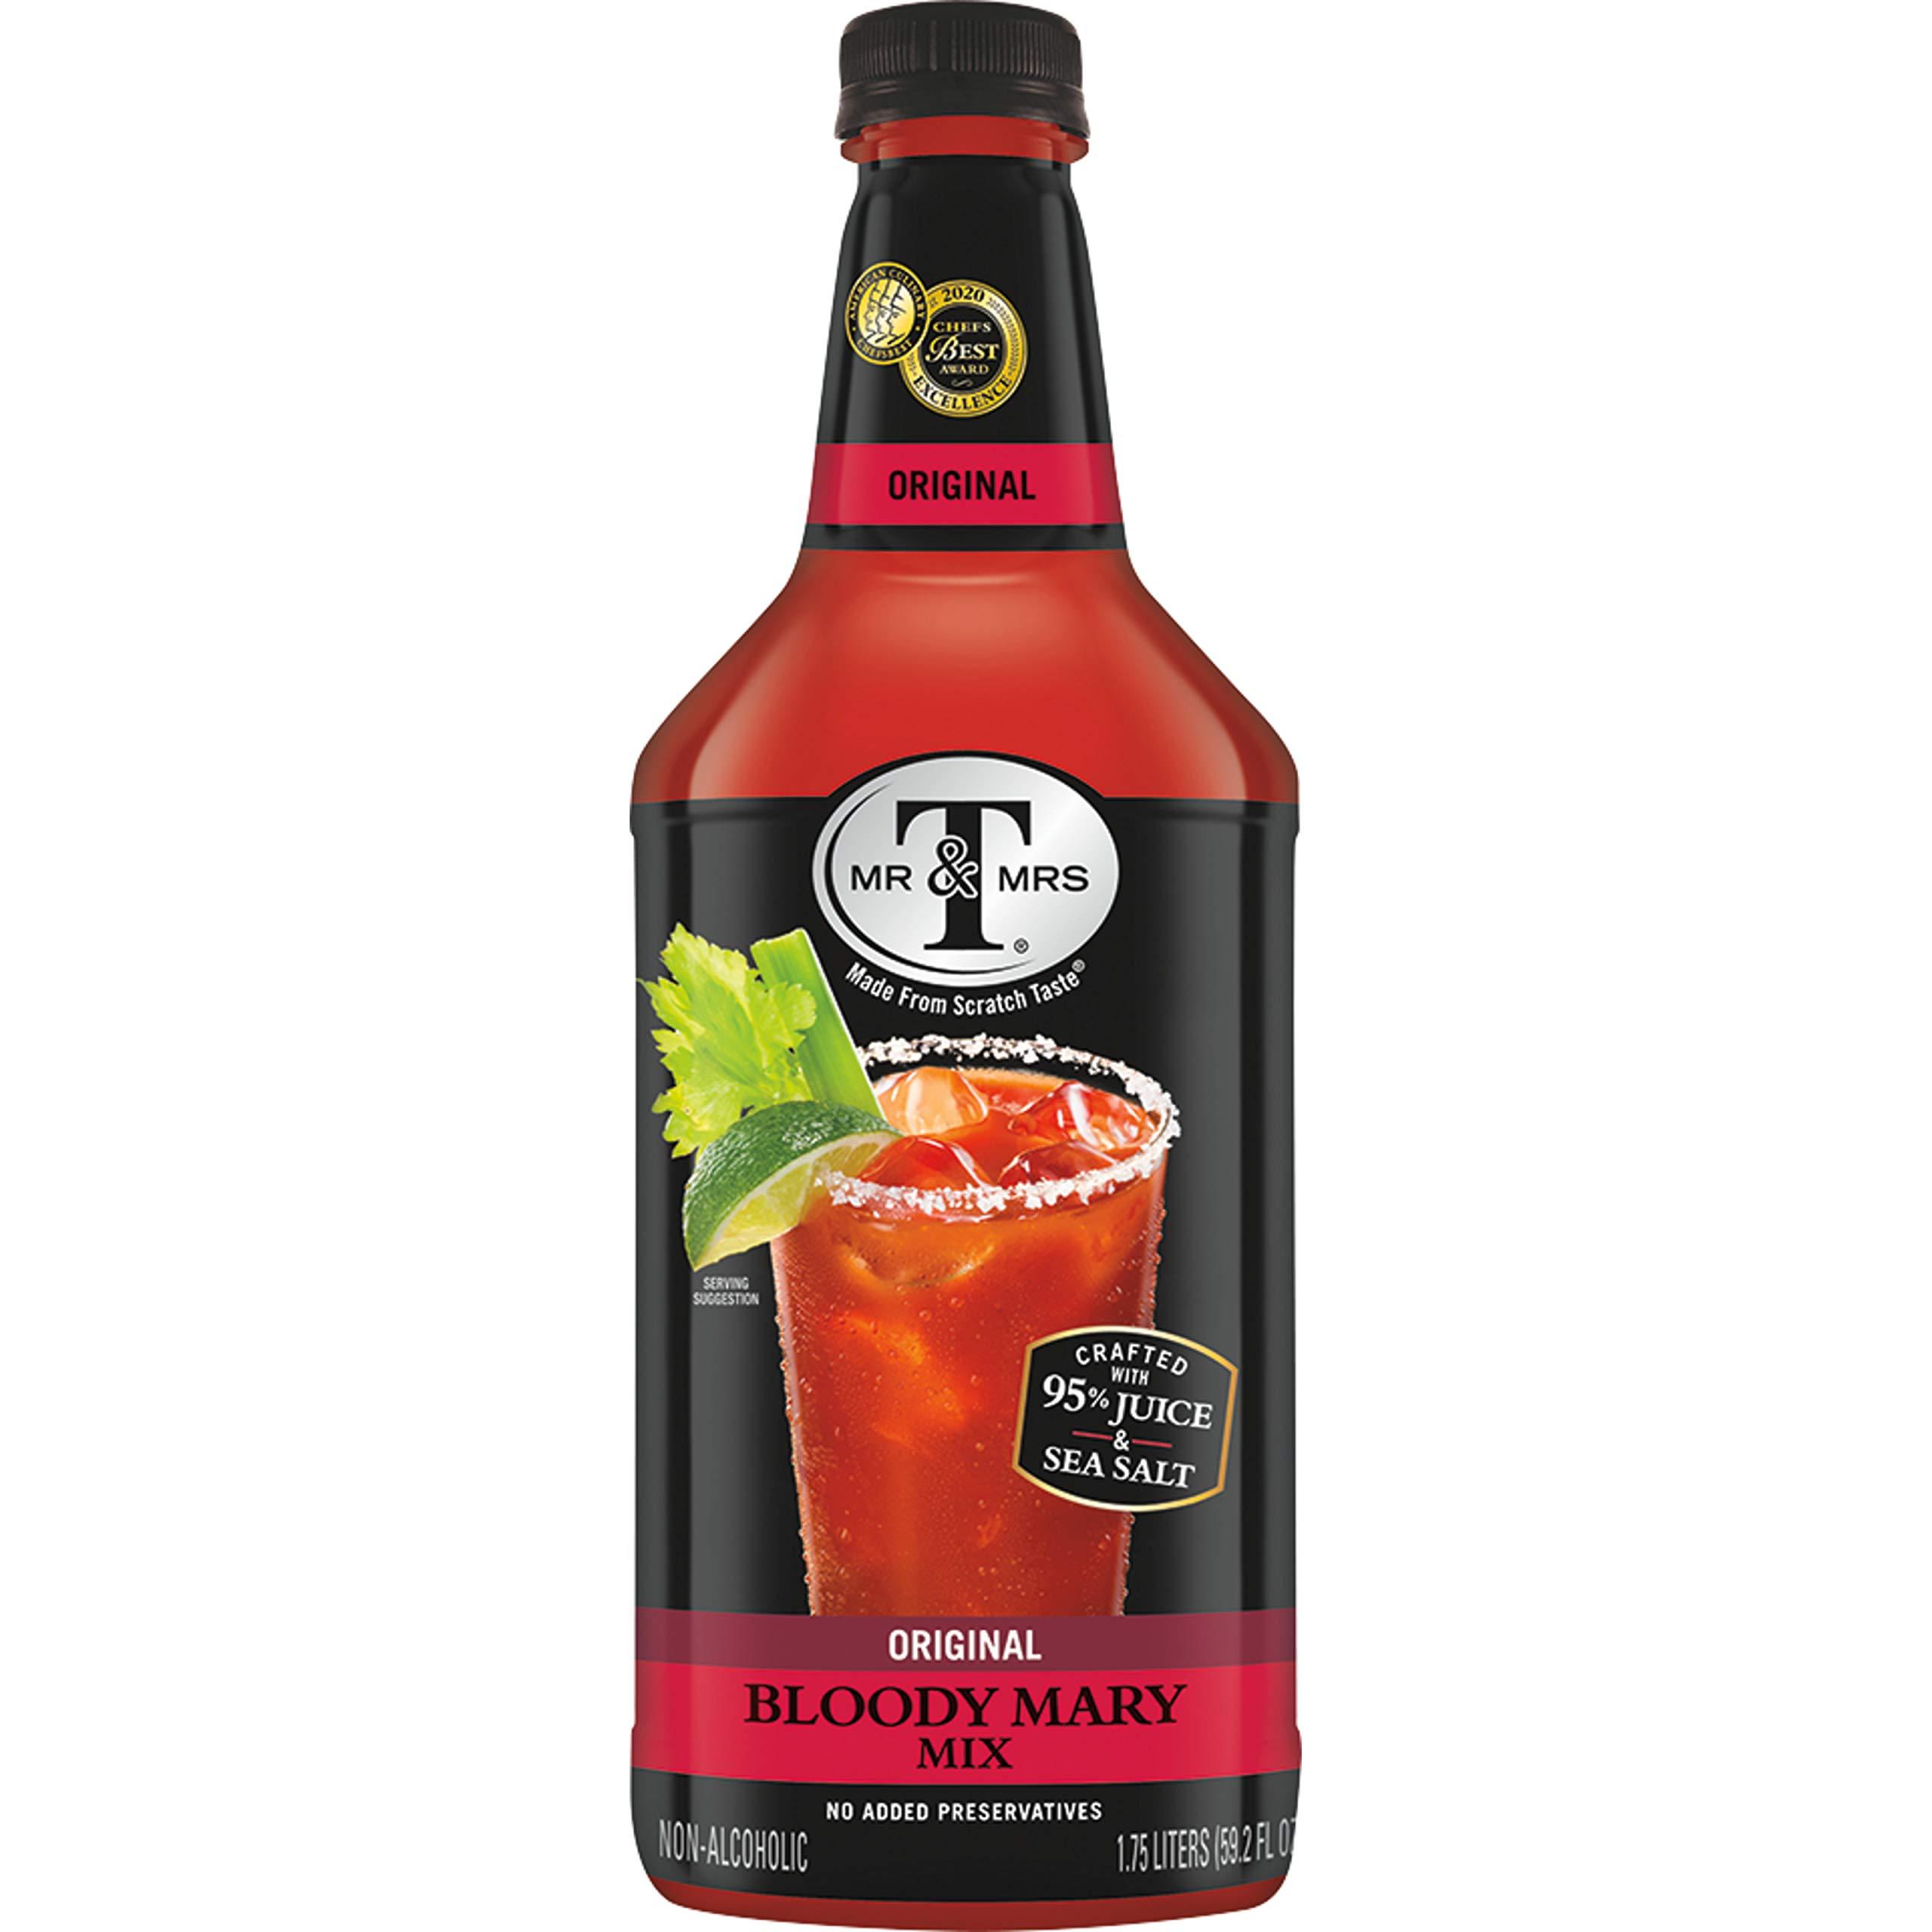 Mr & Mrs T Original Bloody Mary Mix, 1.75 Liter Bottle